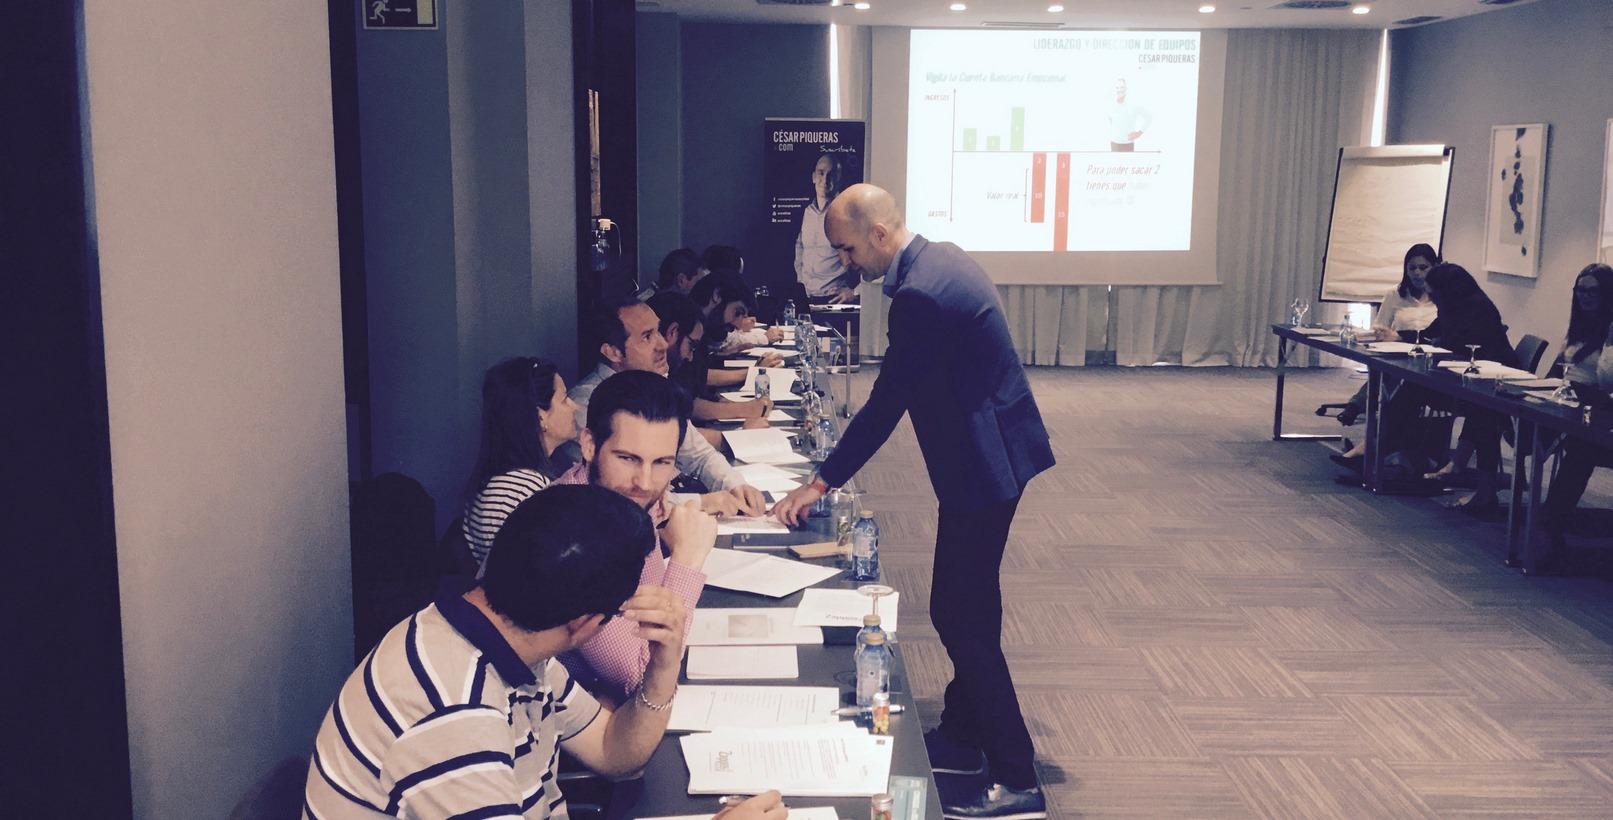 cursos liderazgo valencia